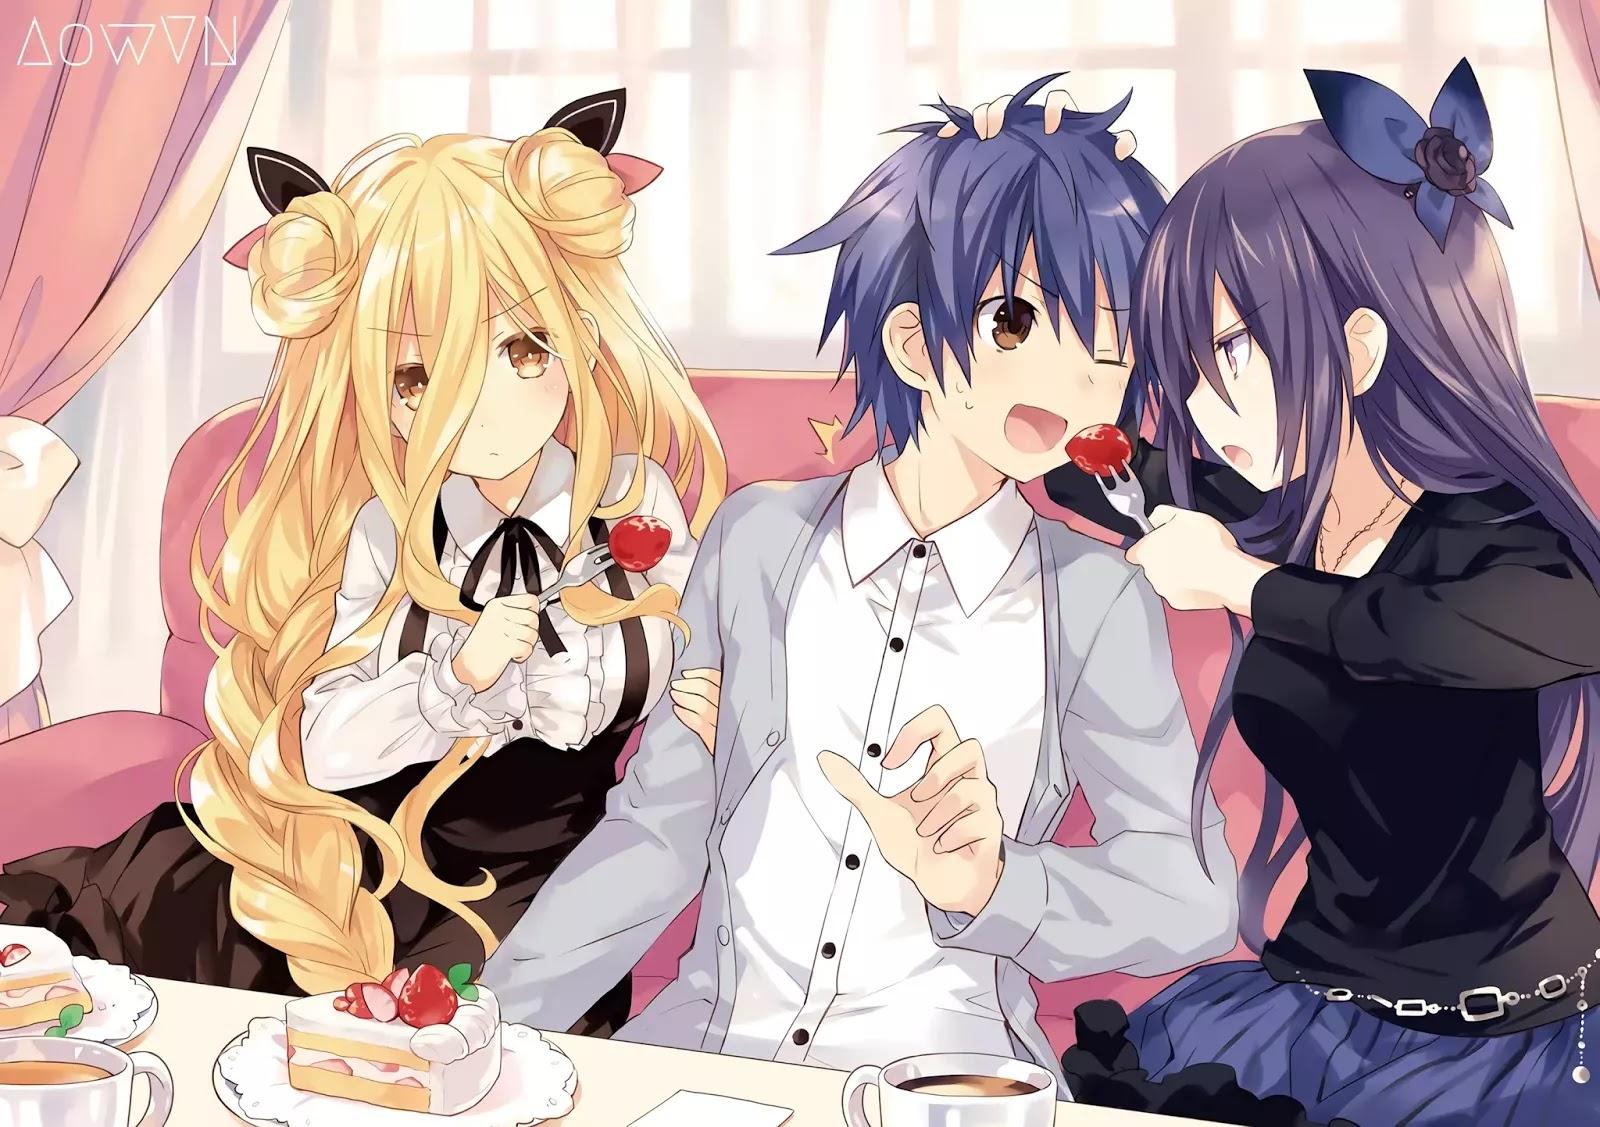 AowVN.org min%2B%25282%2529 - [ Anime 3gp Mp4 ] Date a live SS1 + SS2 + OVA + Movie | Vietsub - Harem Hay